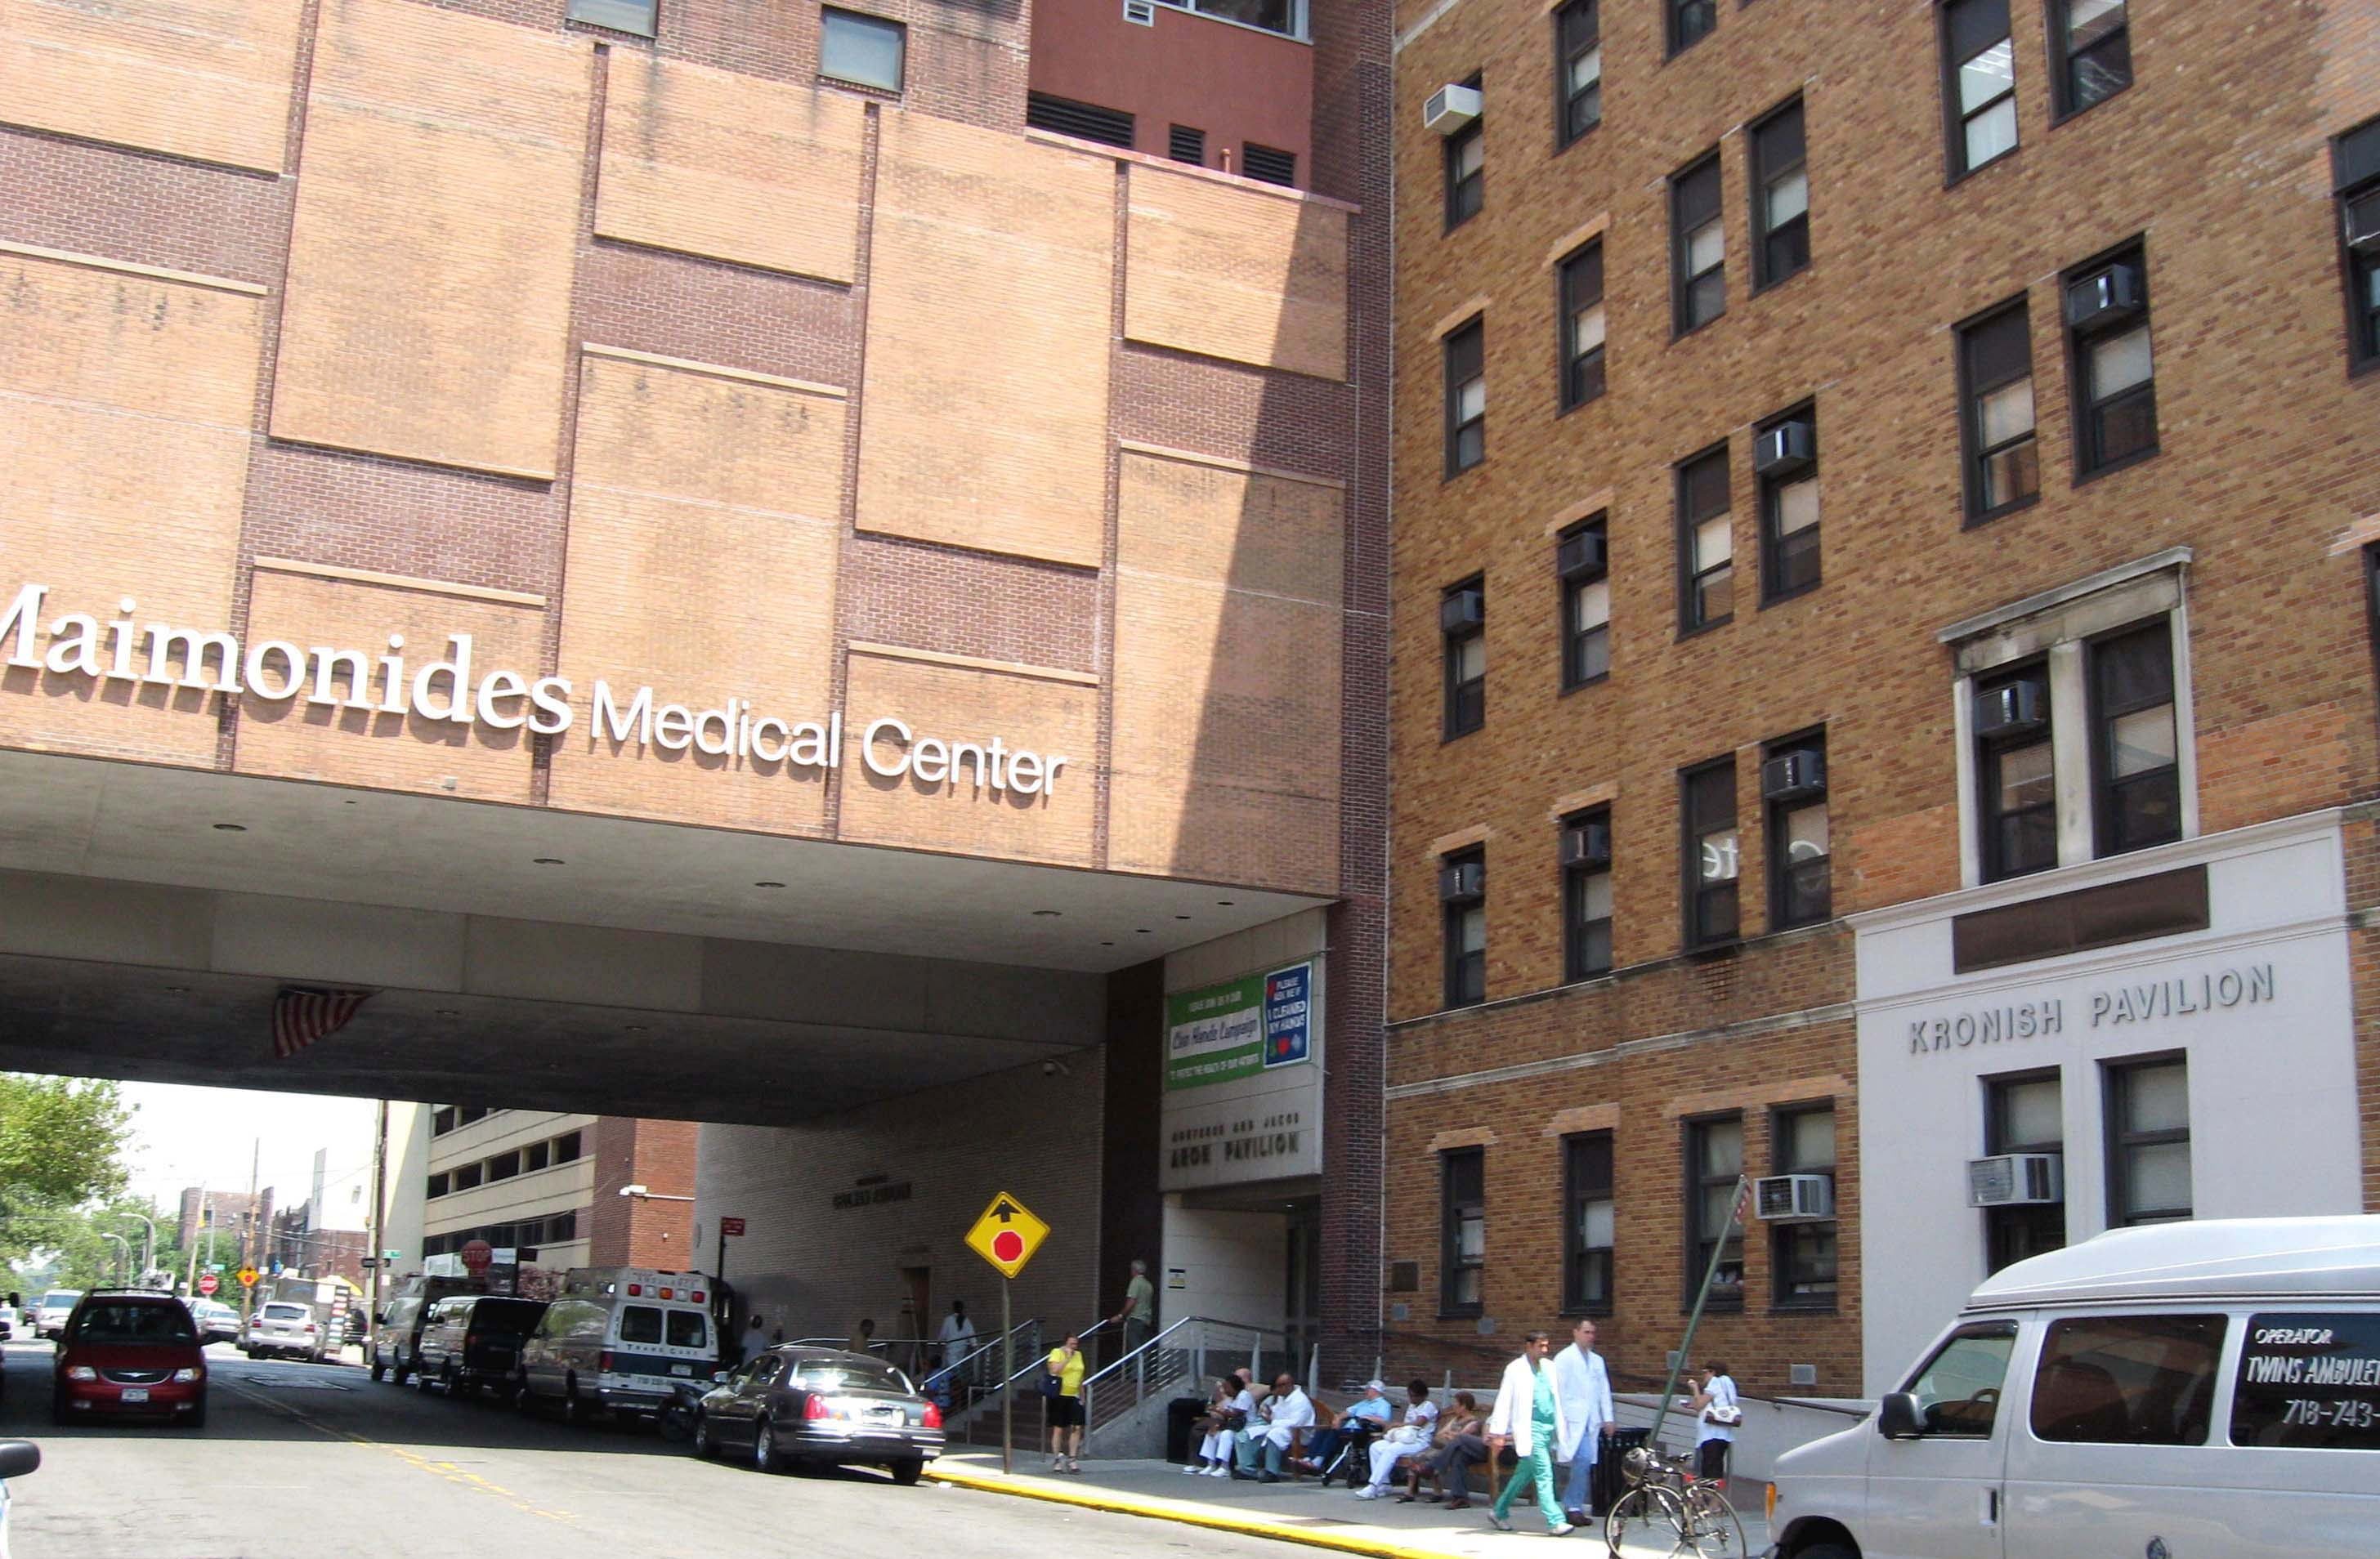 Maimonides Medical Center - Wikipedia